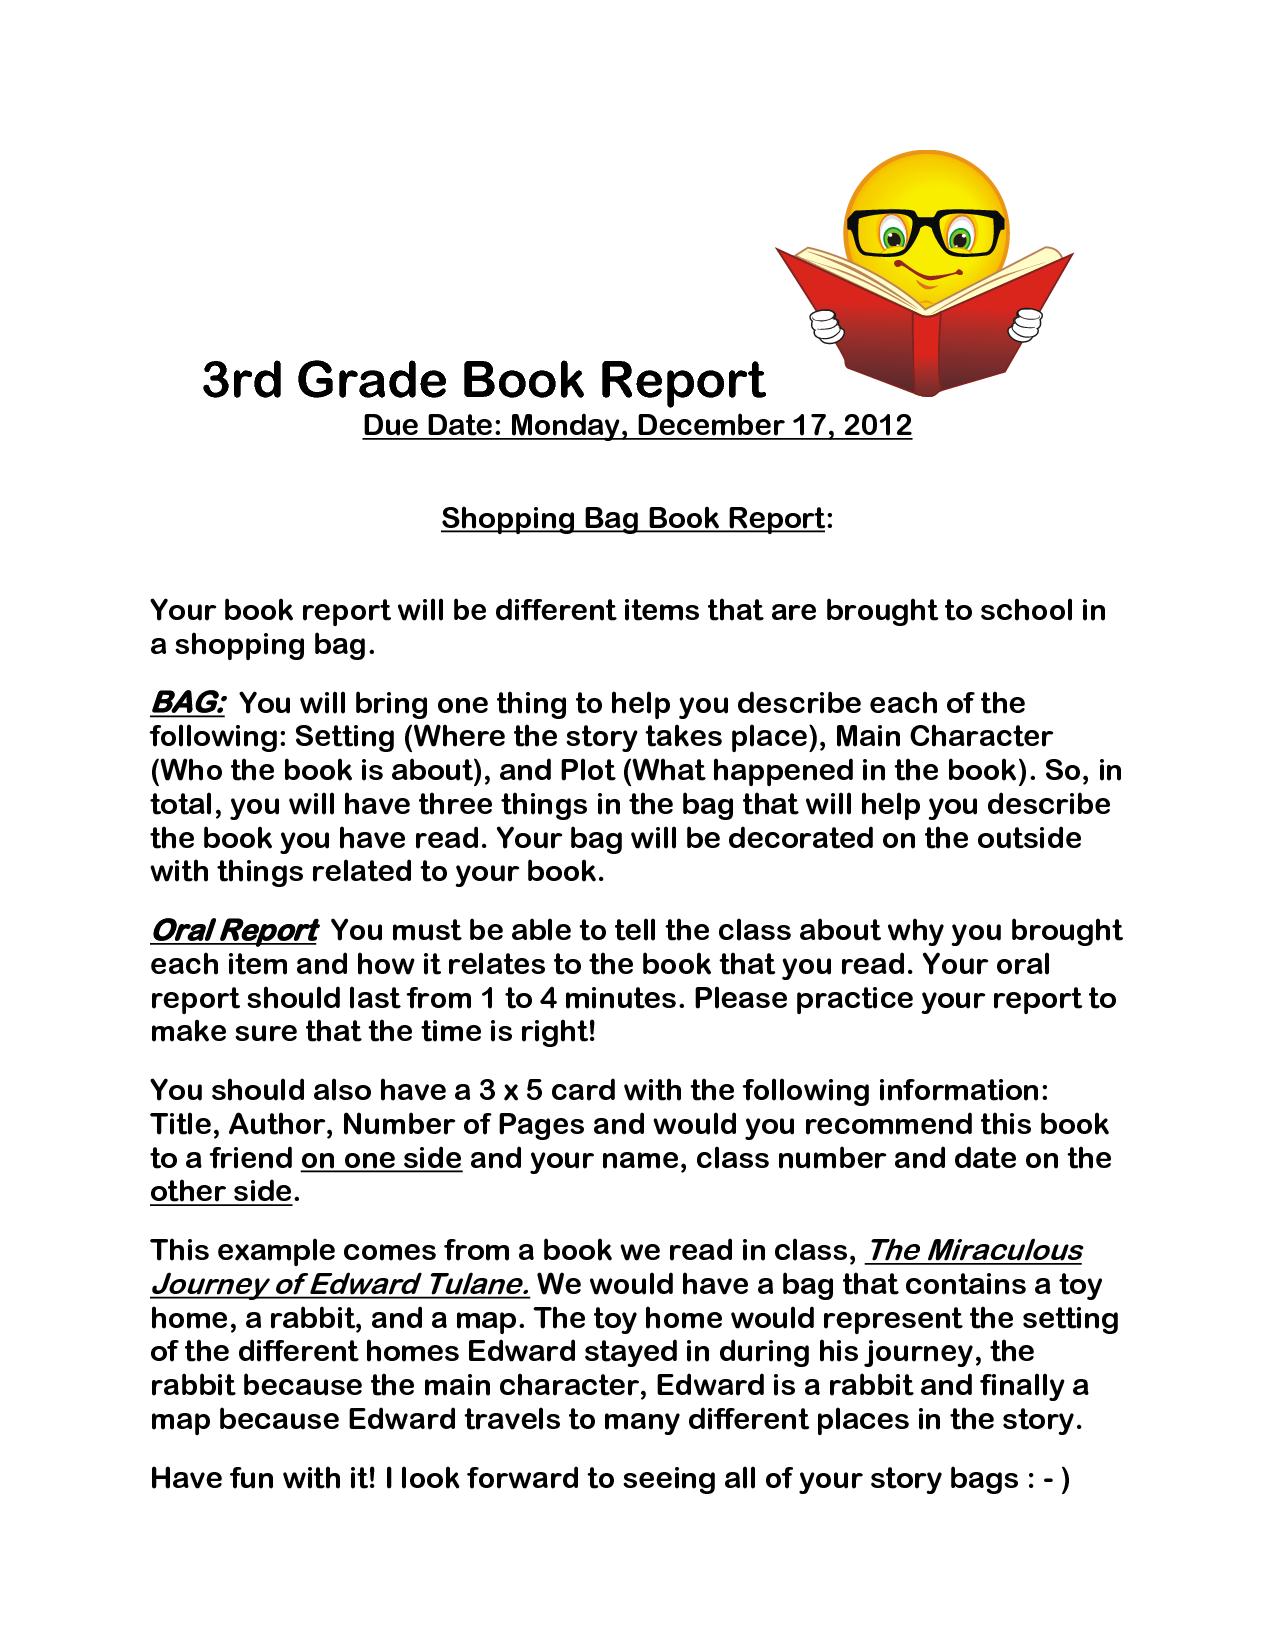 How To Write Book Report 3rd Grade